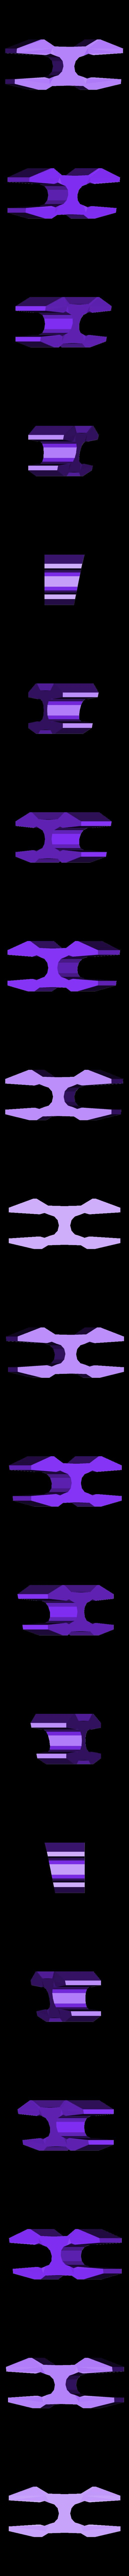 mini_T-34_hull-connector.stl Download STL file Mini T-34 • 3D printer model, c47